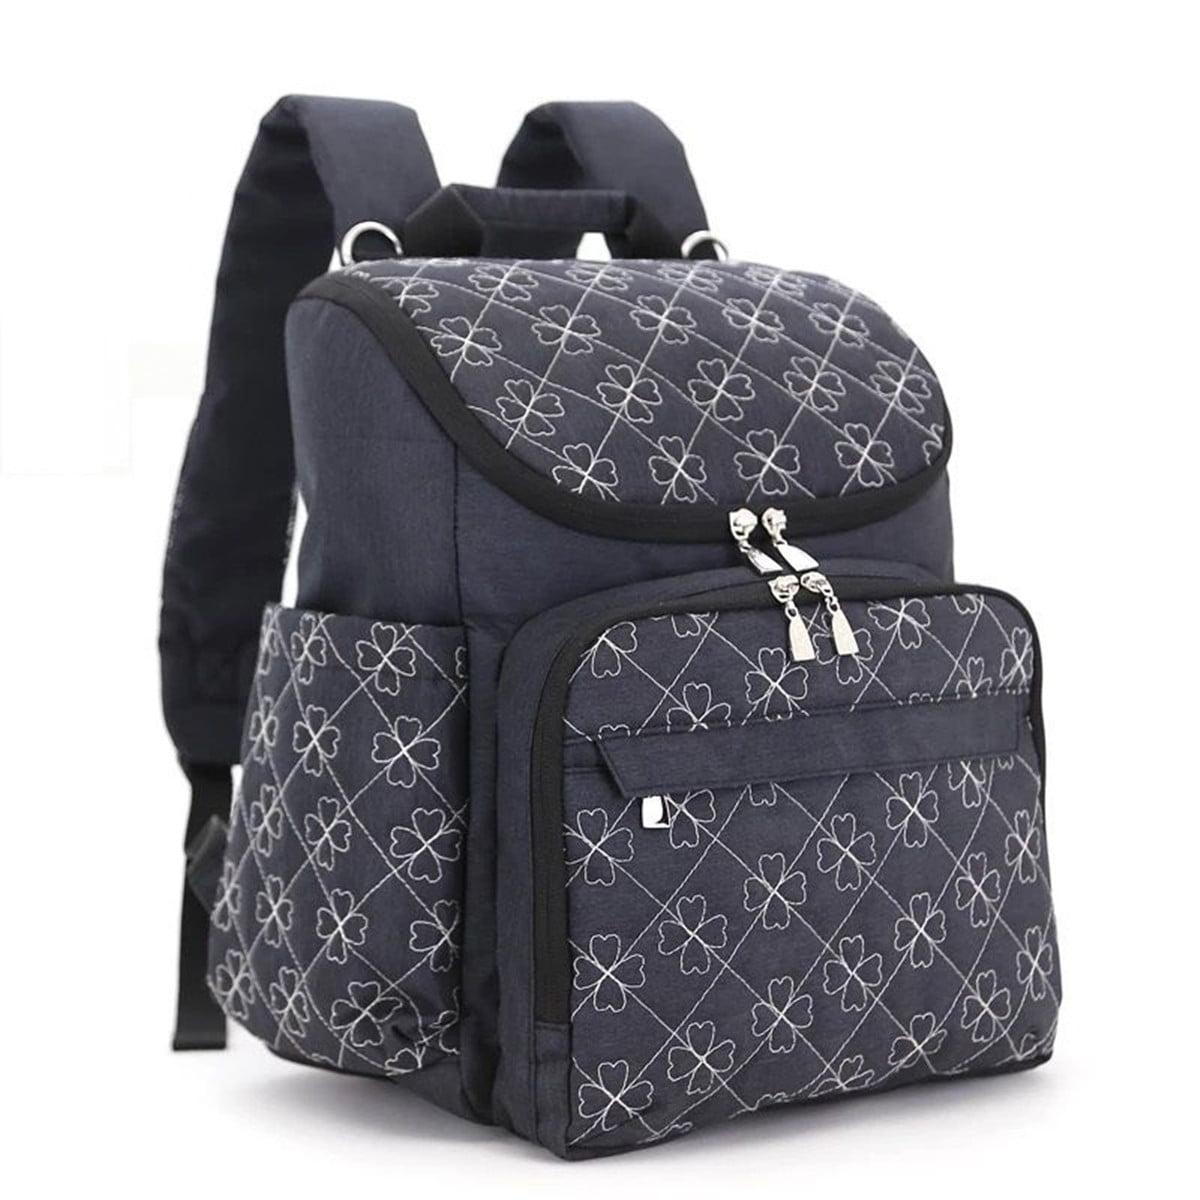 New Mummy Maternity Baby Diaper Bag Travel Backpack Nappy Organizer Nursing Tote